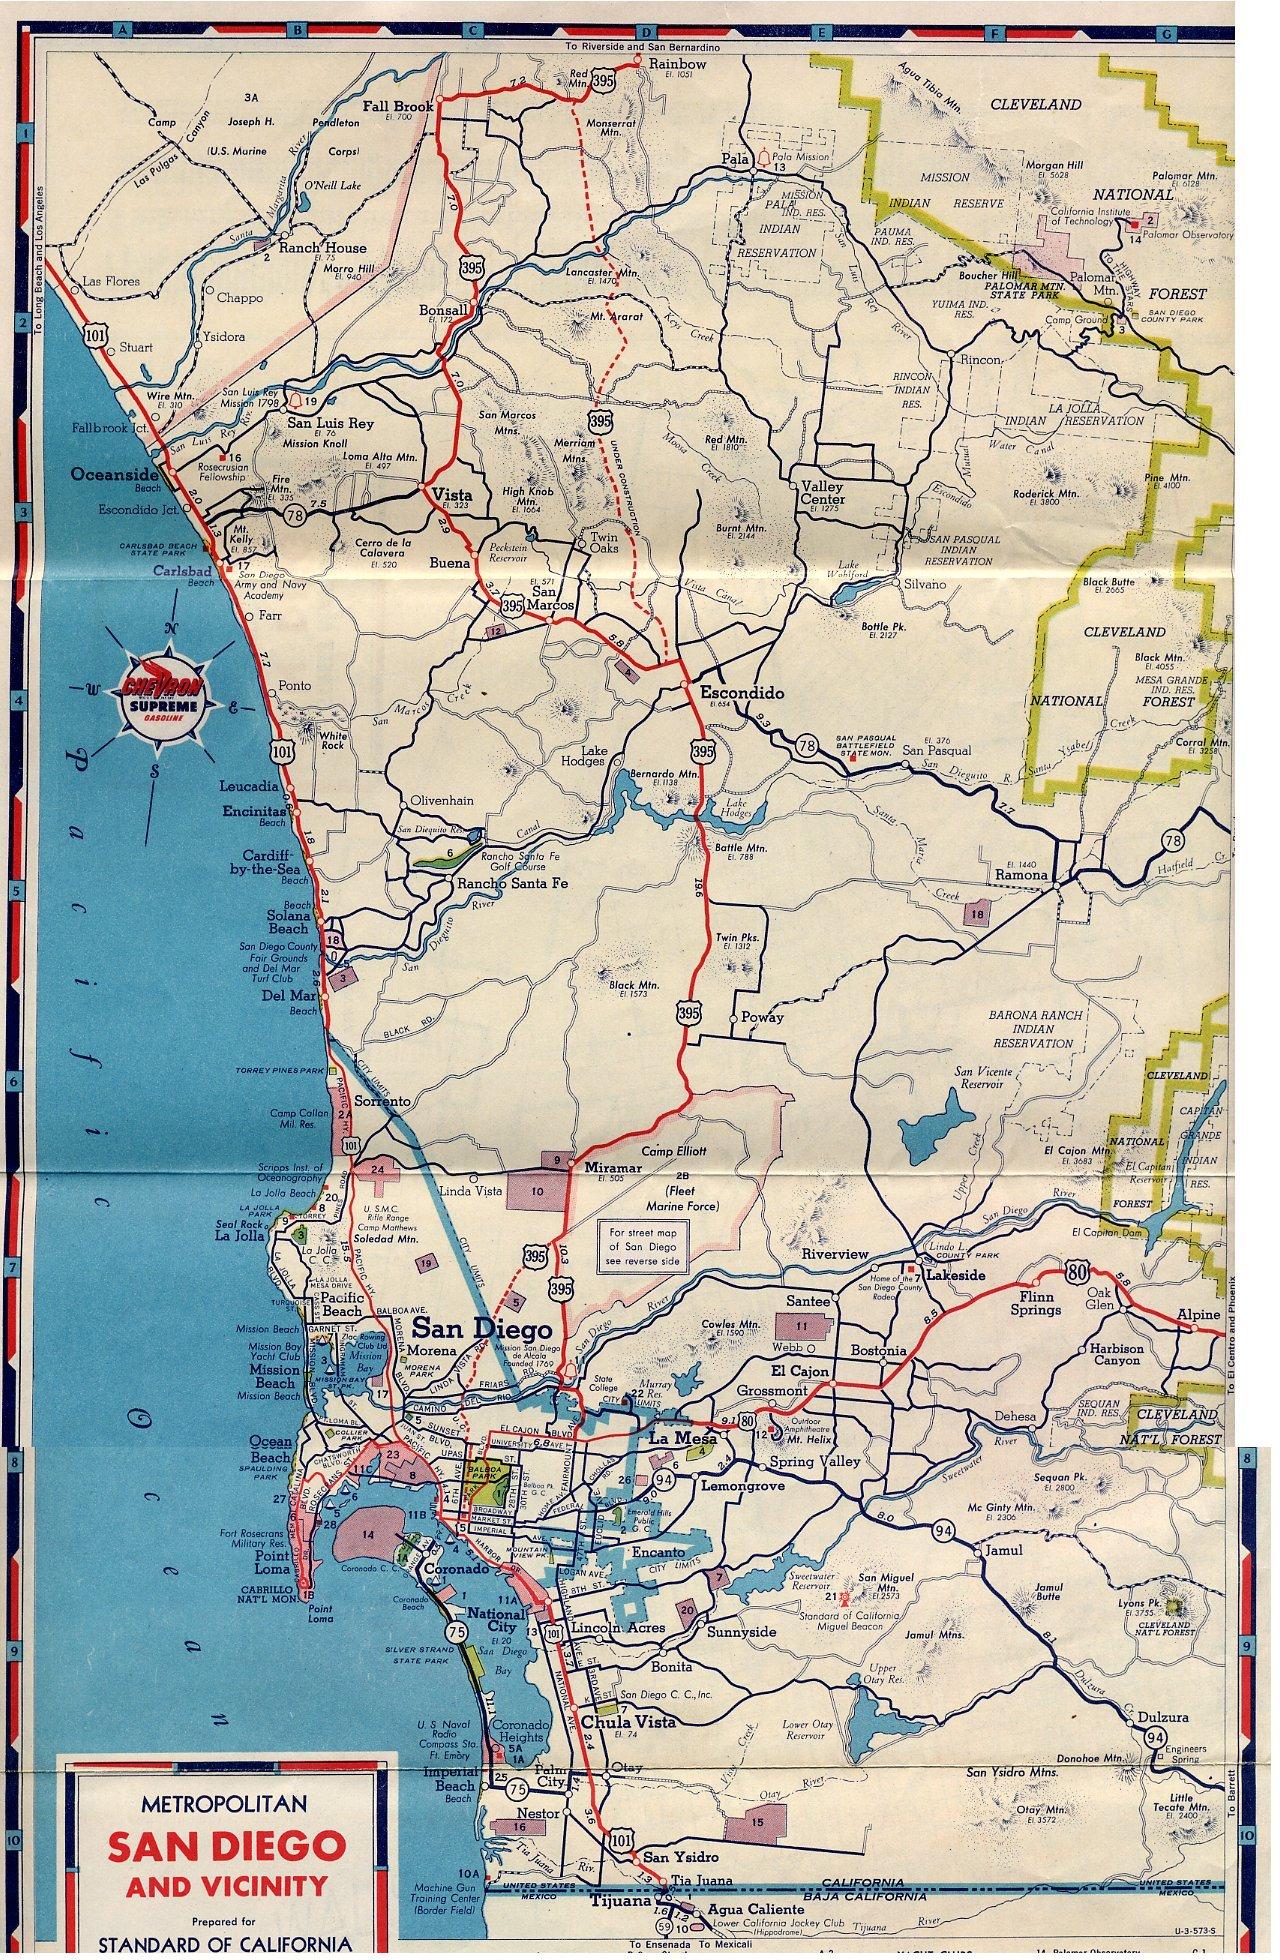 U.s. 395 - San Diego Original & Final Routes - Route 395 California Map